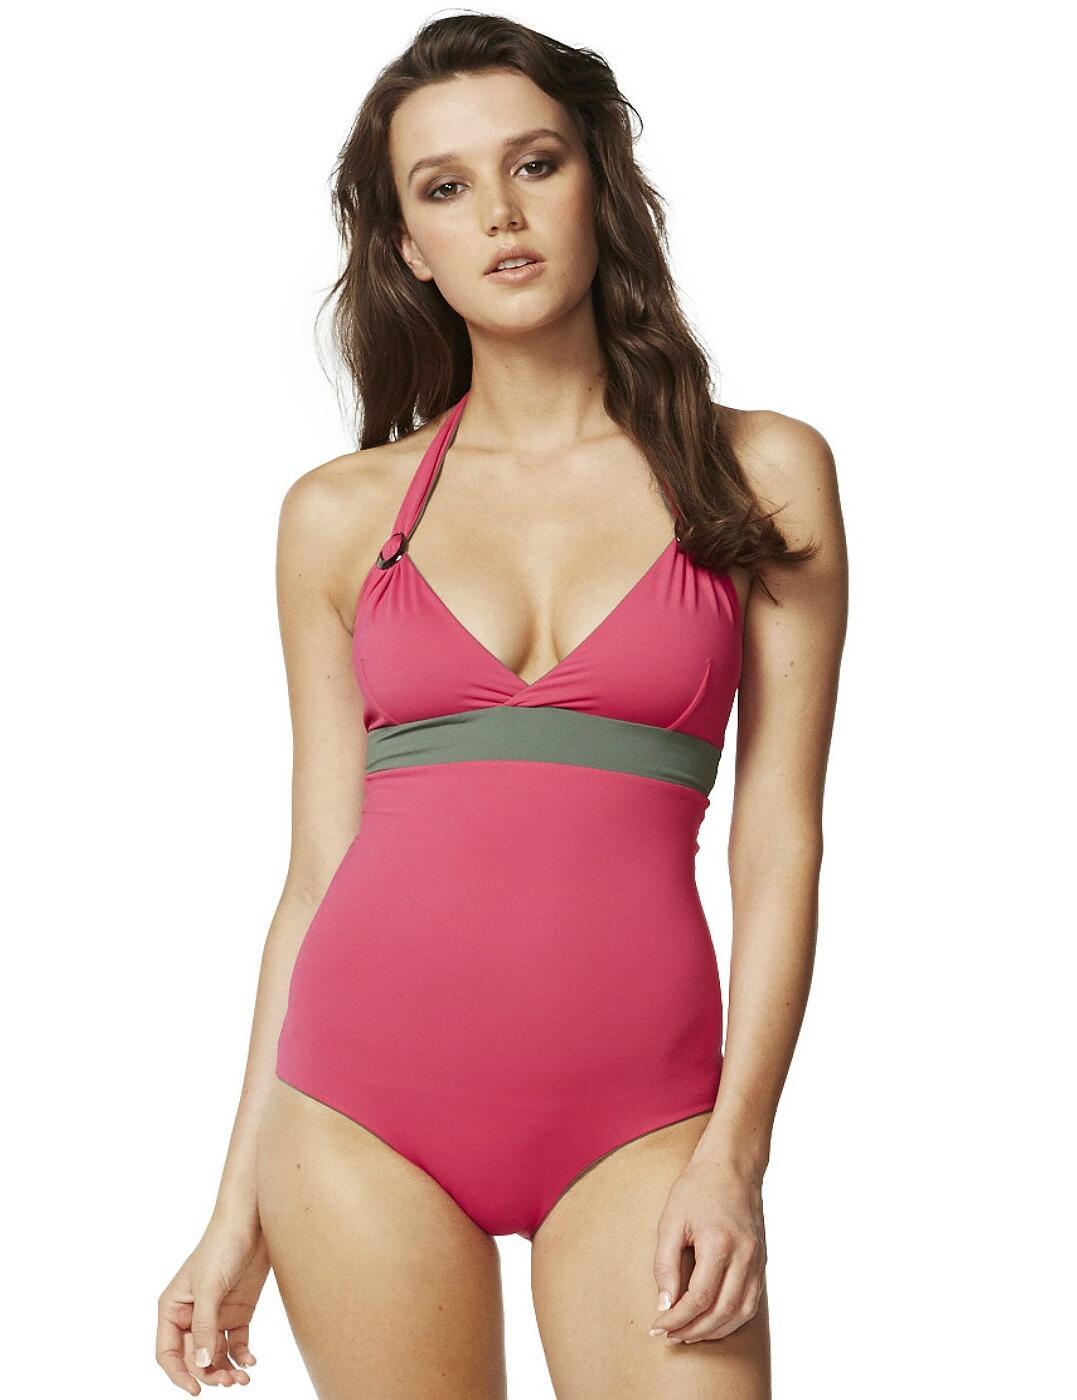 M4417RS Moontide Reversible Halterneck Swimwear - M4417RS Olive/Raspberry